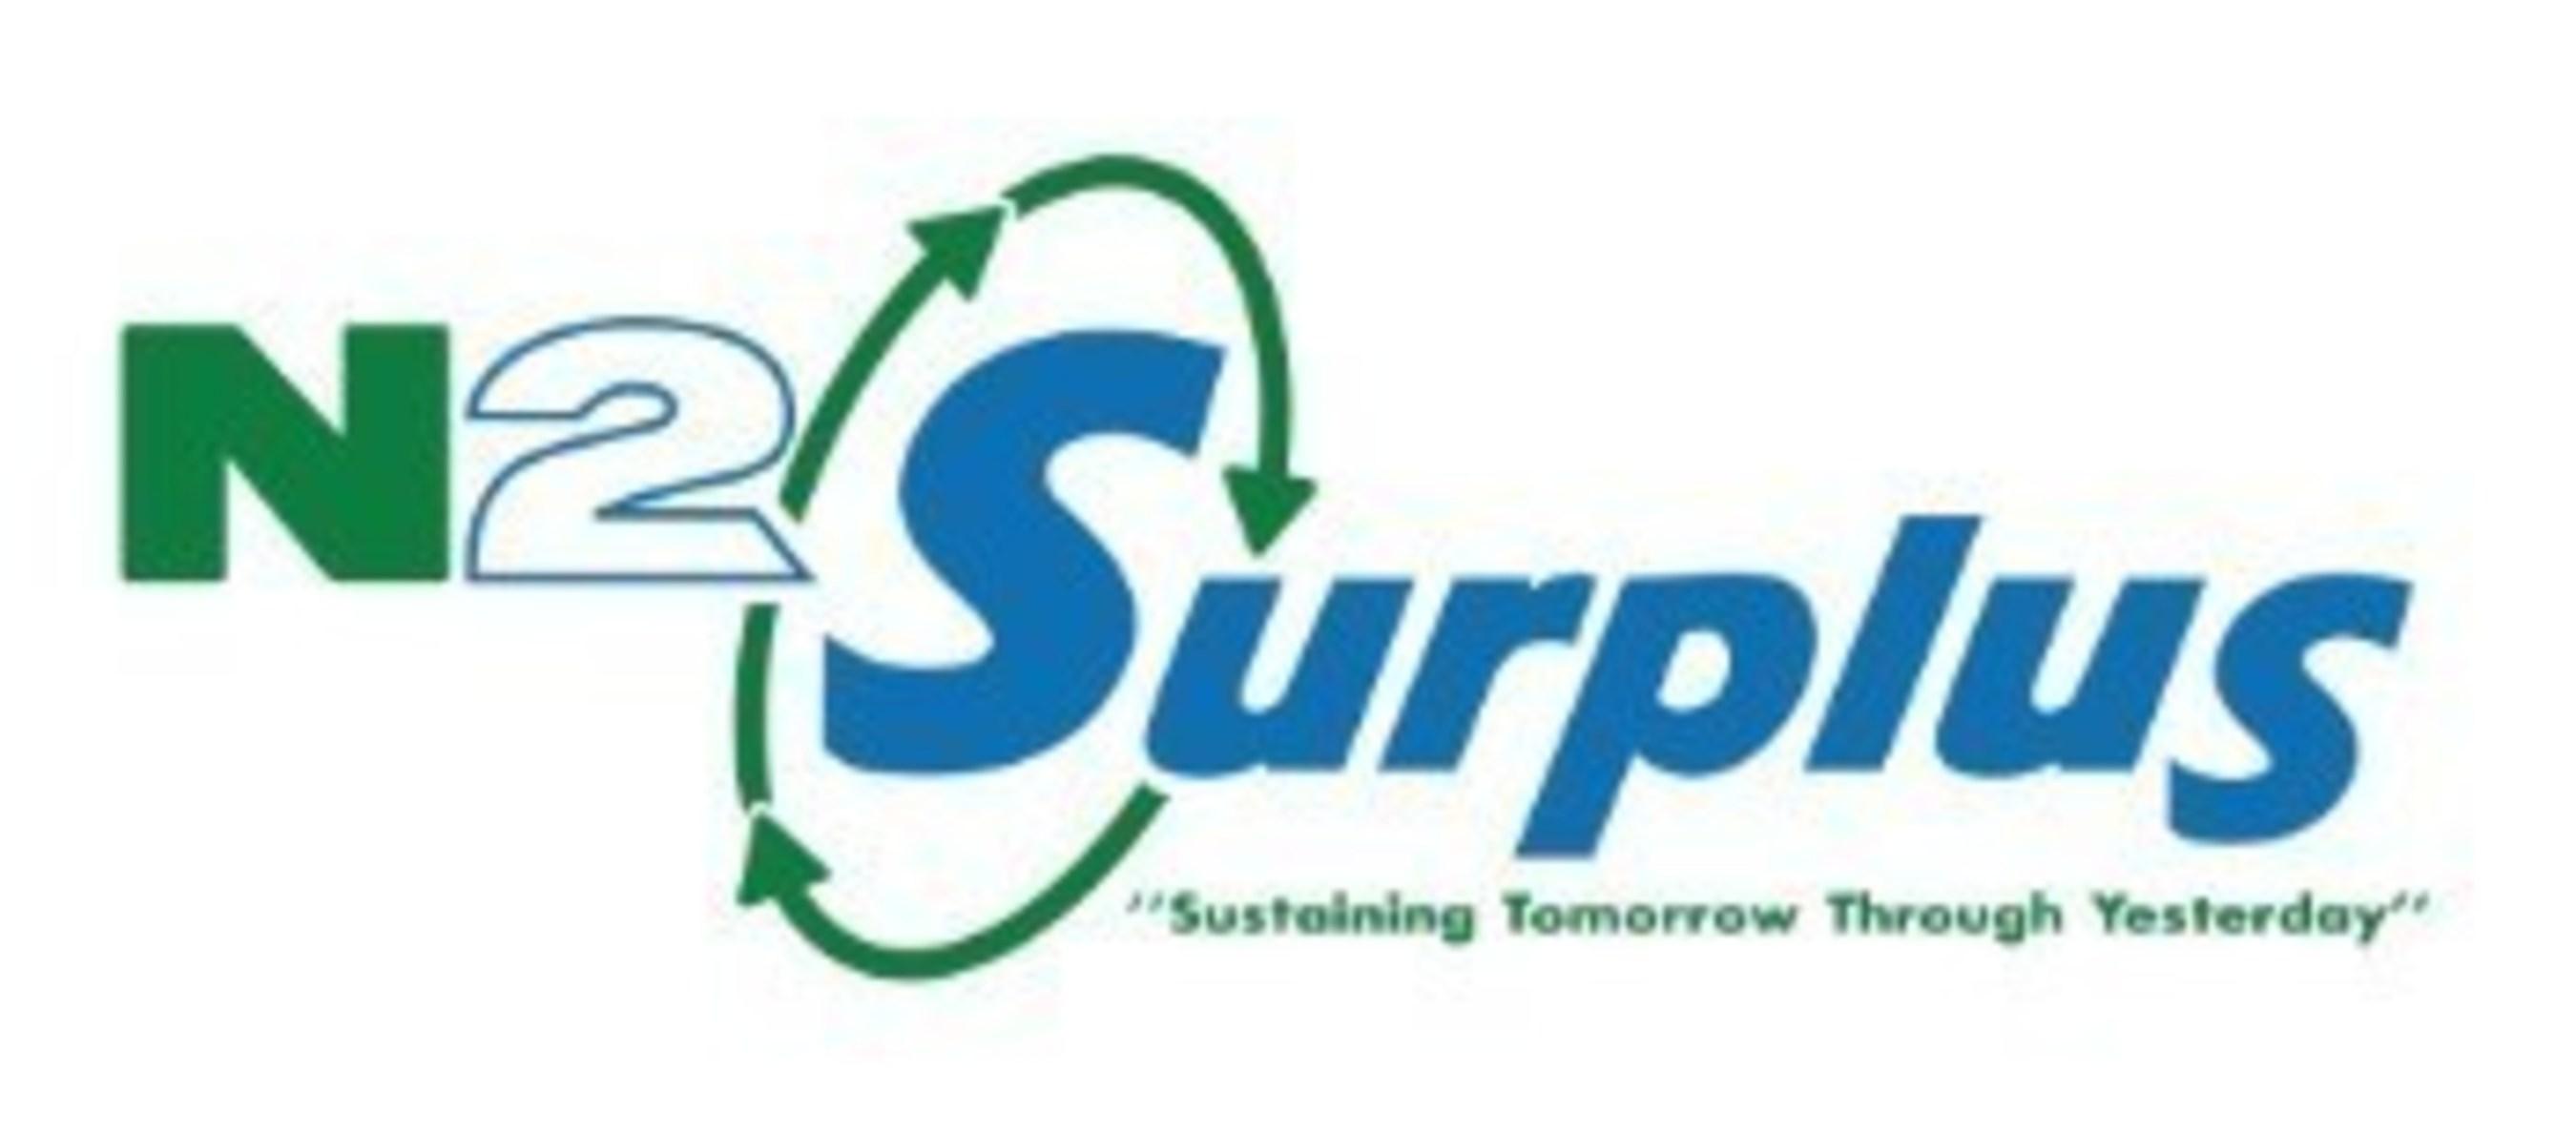 N2Surplus Partners with Linortek to Market Advanced Monitoring Tech